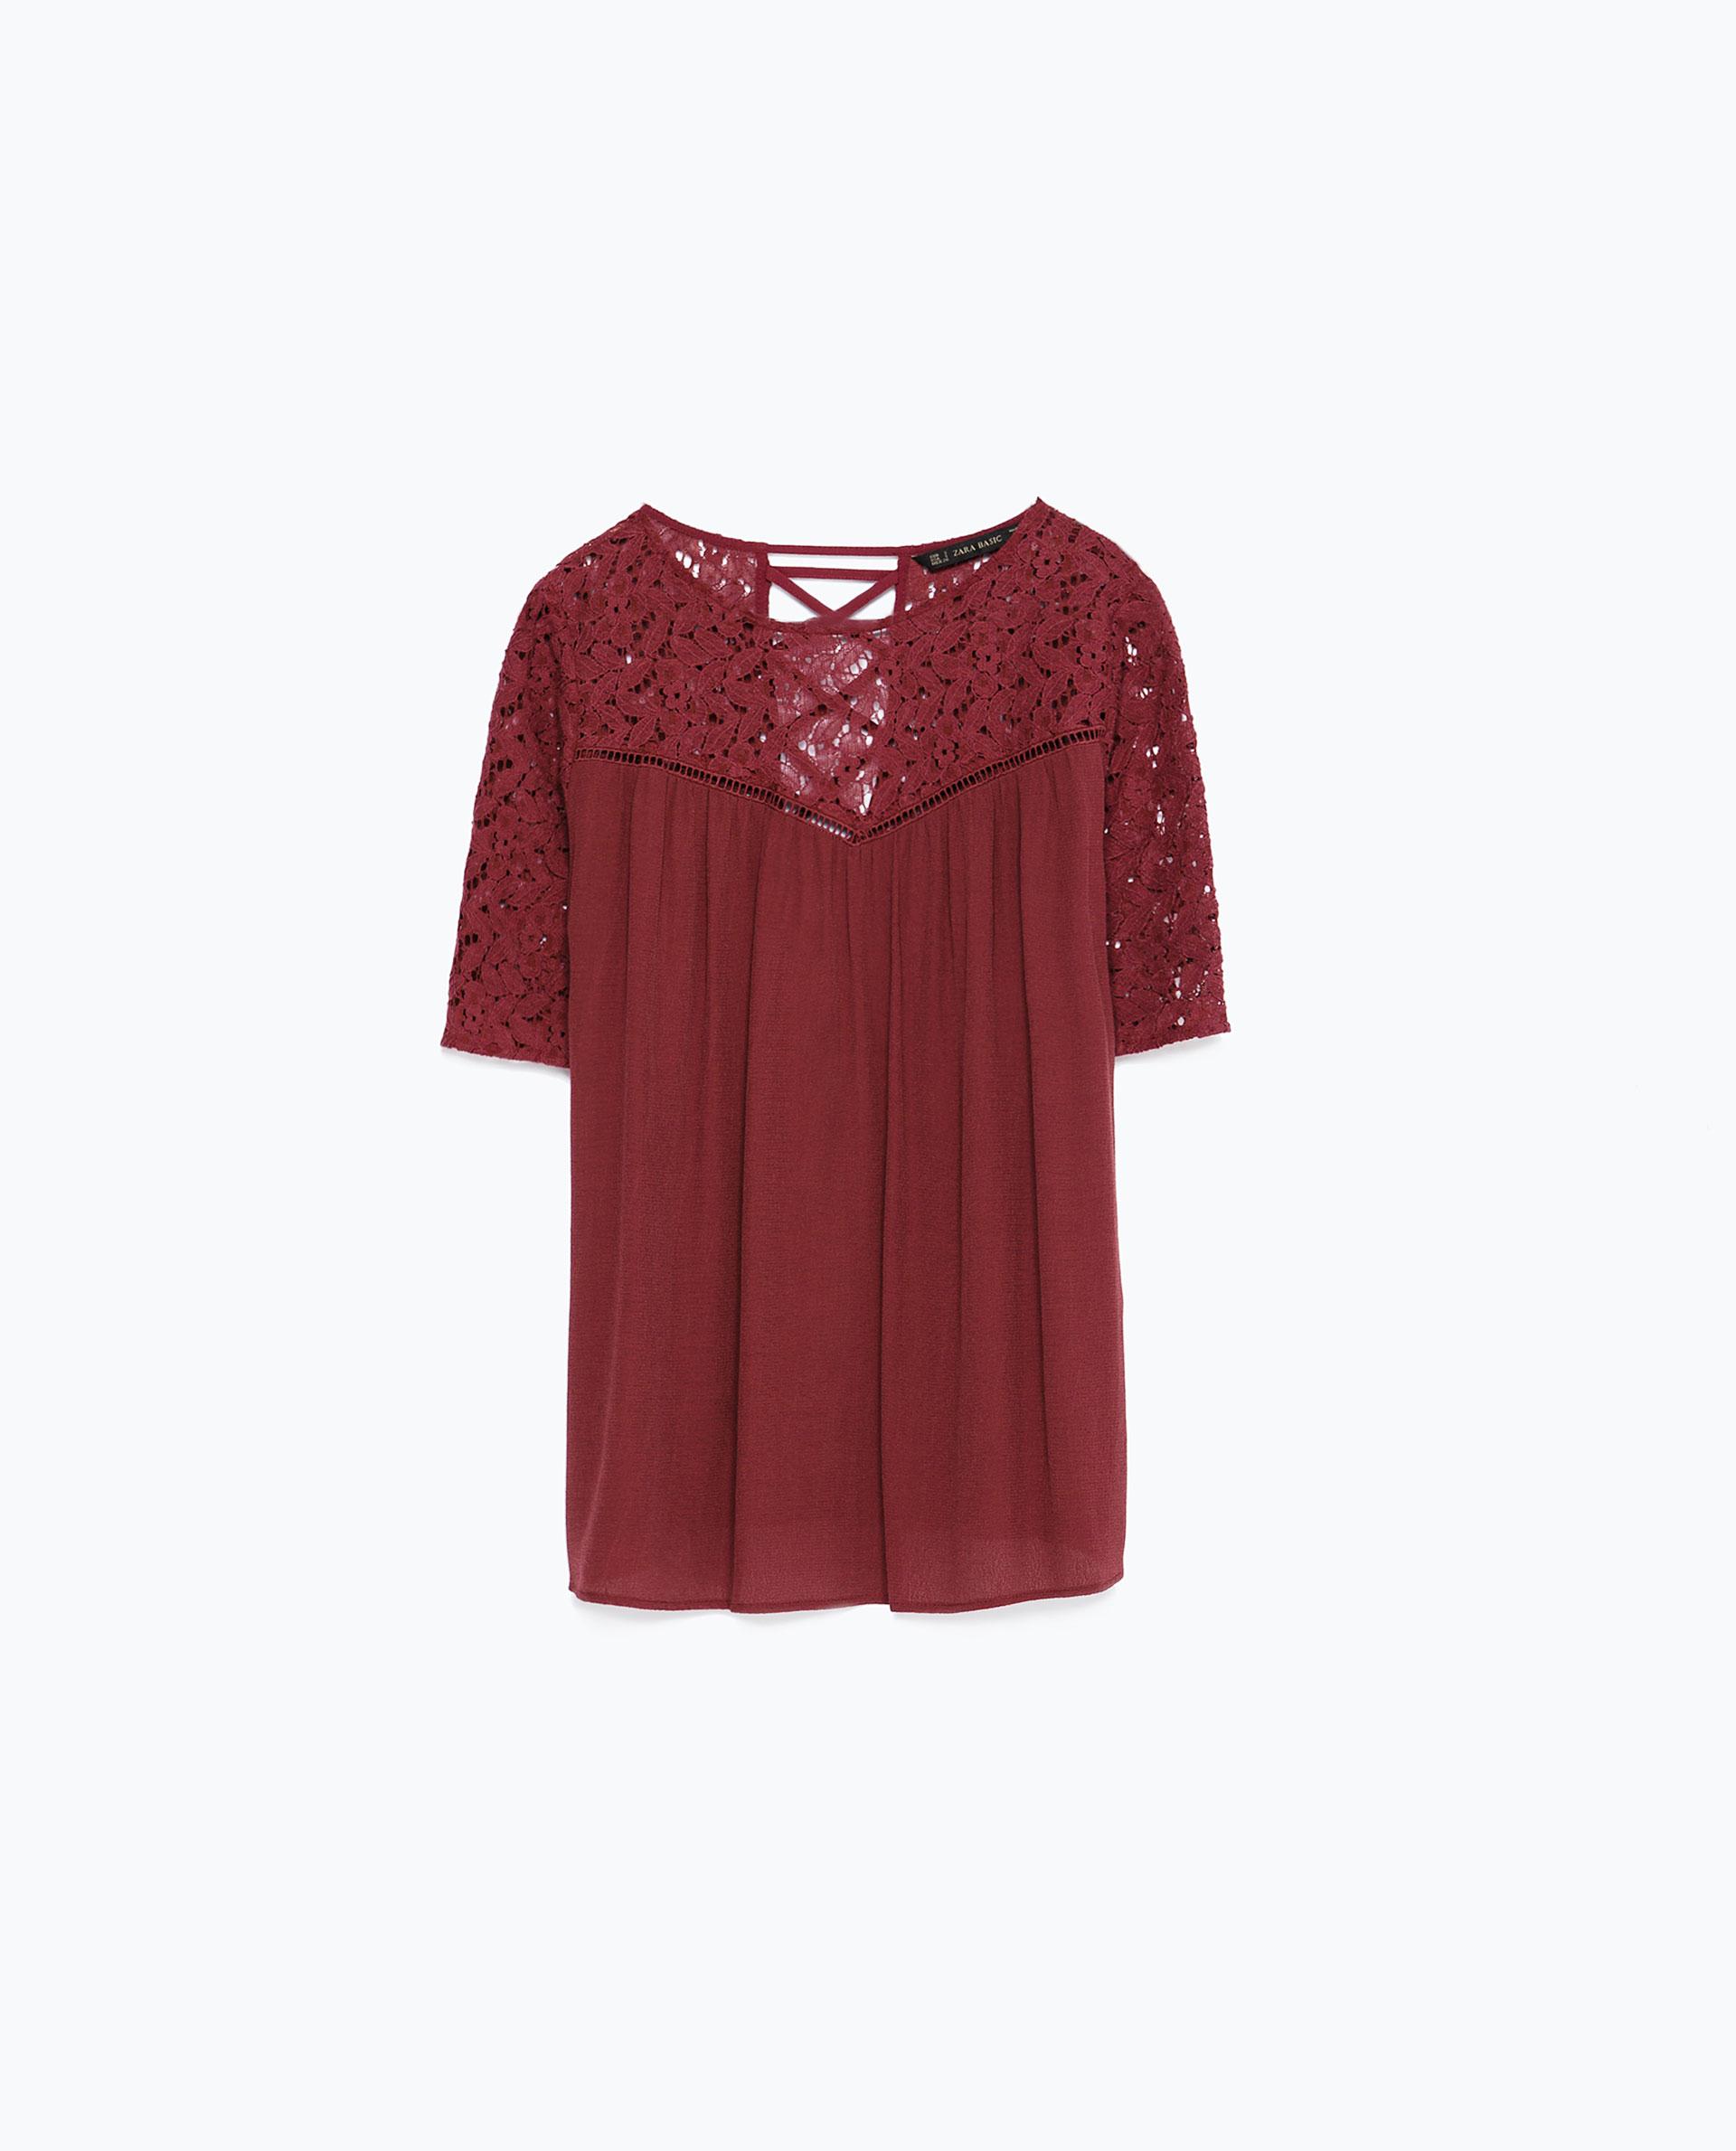 Zara Purple Blouse 23